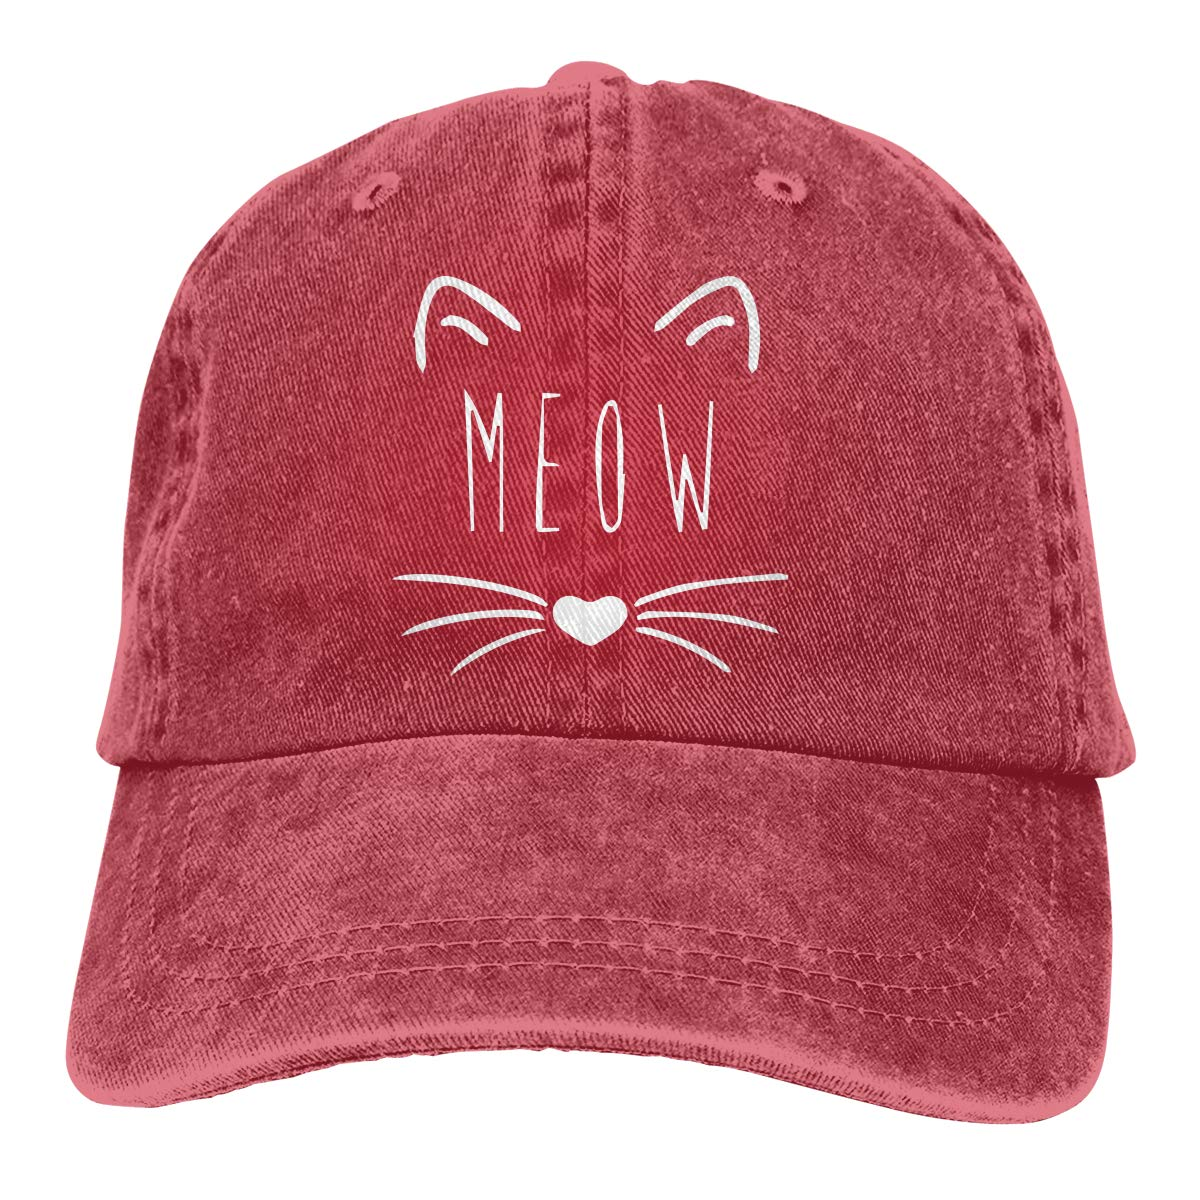 662d8842c402c Cat Meow Most Popular Personalized Vintage Lastest Men   Women Adjustable  Denim Dad Hat Cotton Baseball Cap Black at Amazon Men s Clothing store